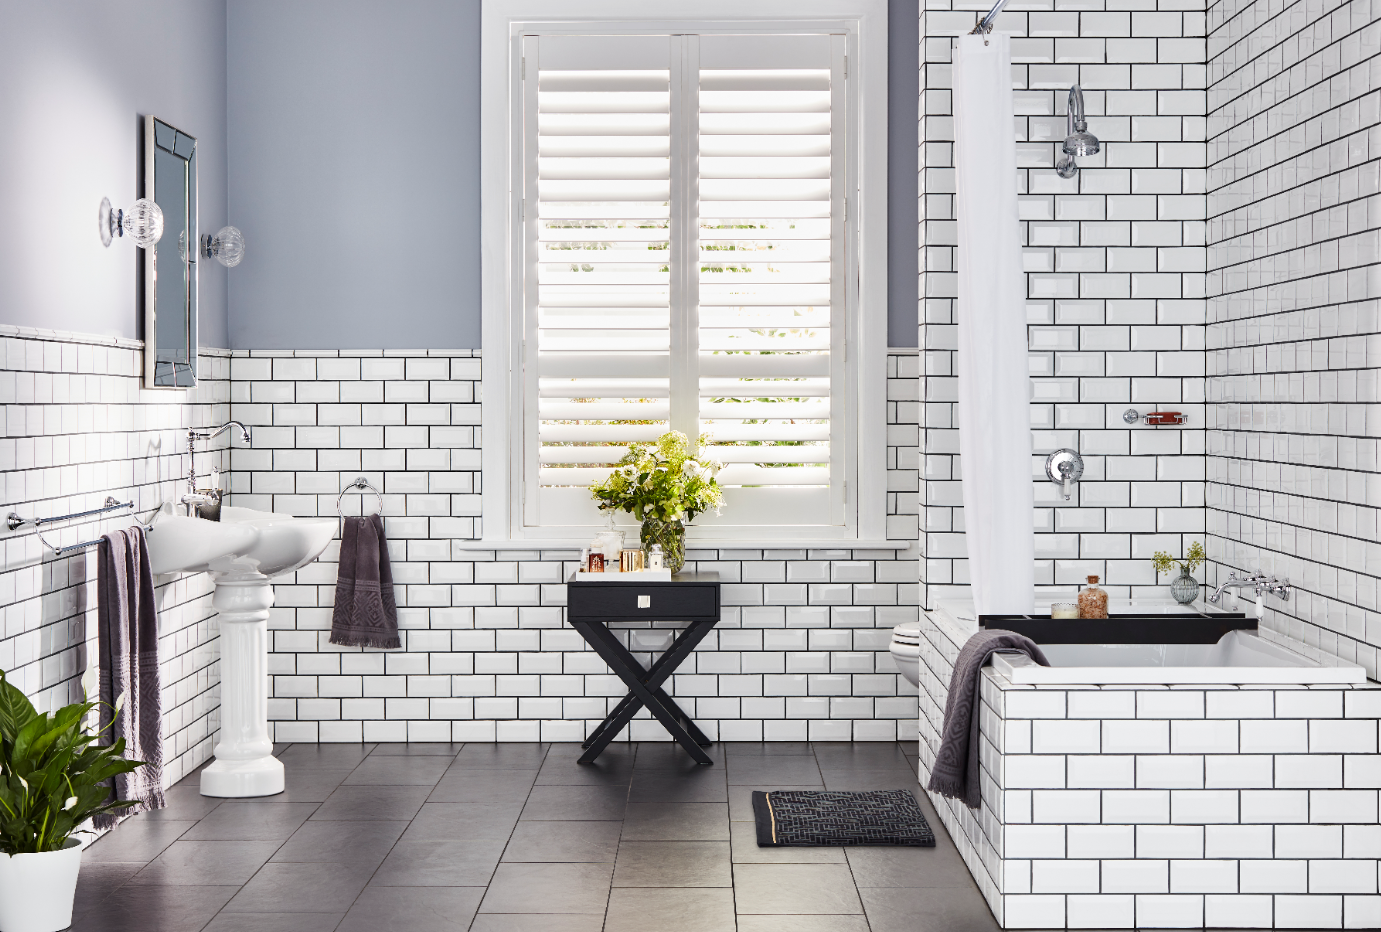 Heritage Bathroom Design Achieved With The Maestro Range From Mondella Bunnings Bunningsbathroom Sub Bathroom Collections Bathroom Design Heritage Bathroom